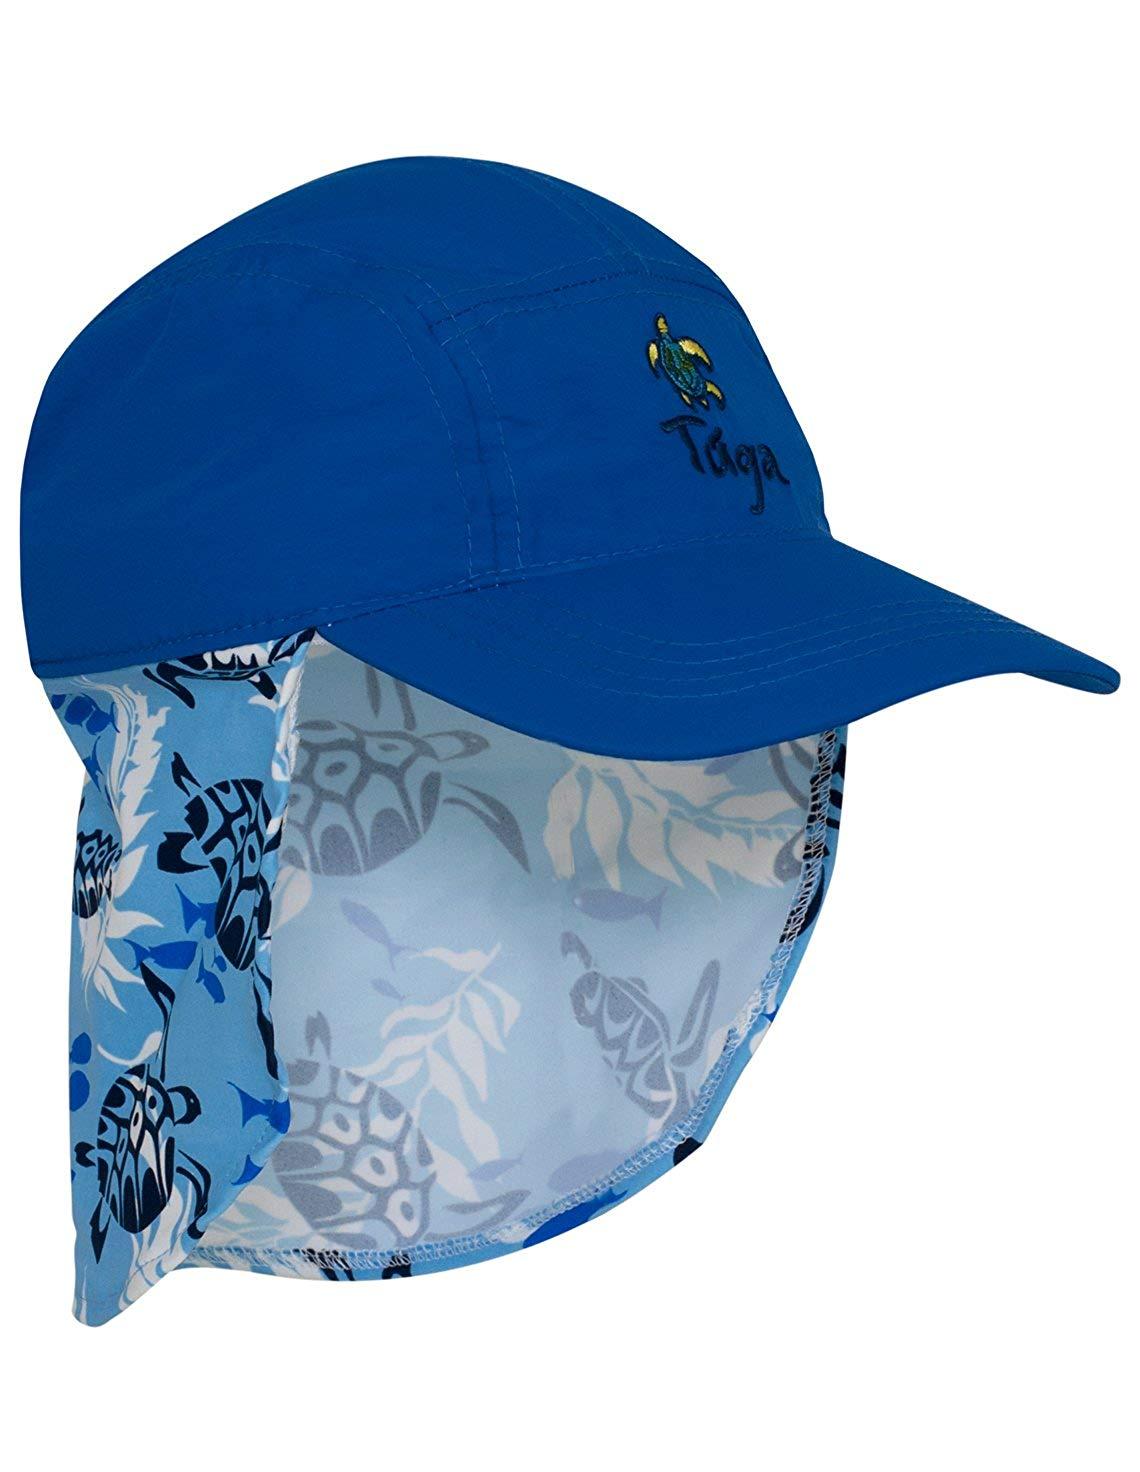 67195616b41 Get Quotations · Tuga Boys Flap Hats - UPF 50+ Sun Protection Sun Hats